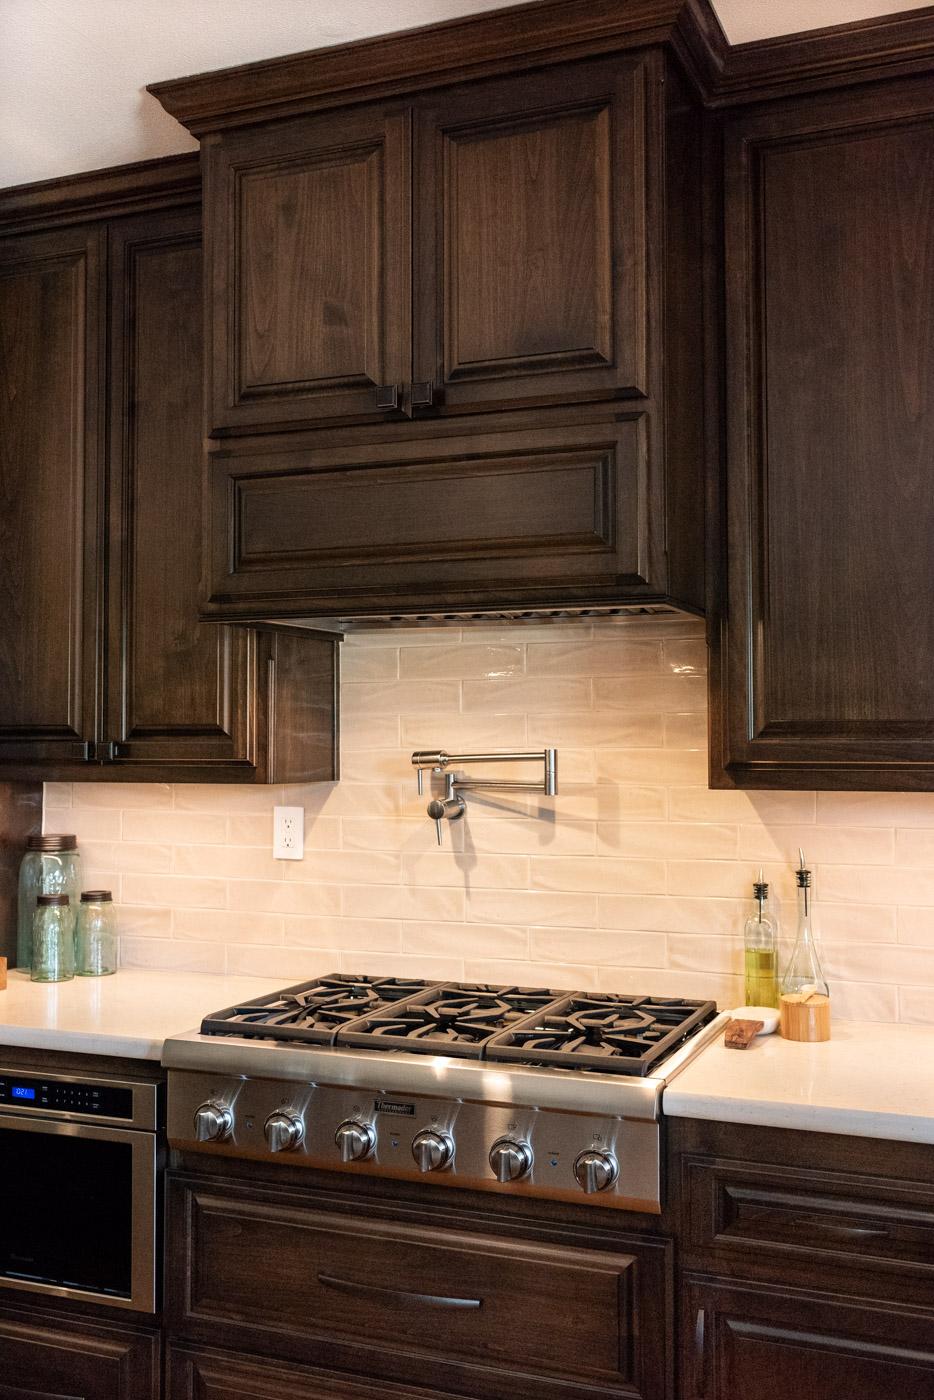 Traditional Mediterranean Custom Kitchen Cabinets In Paso Robles California Sligh Cabinets Inc